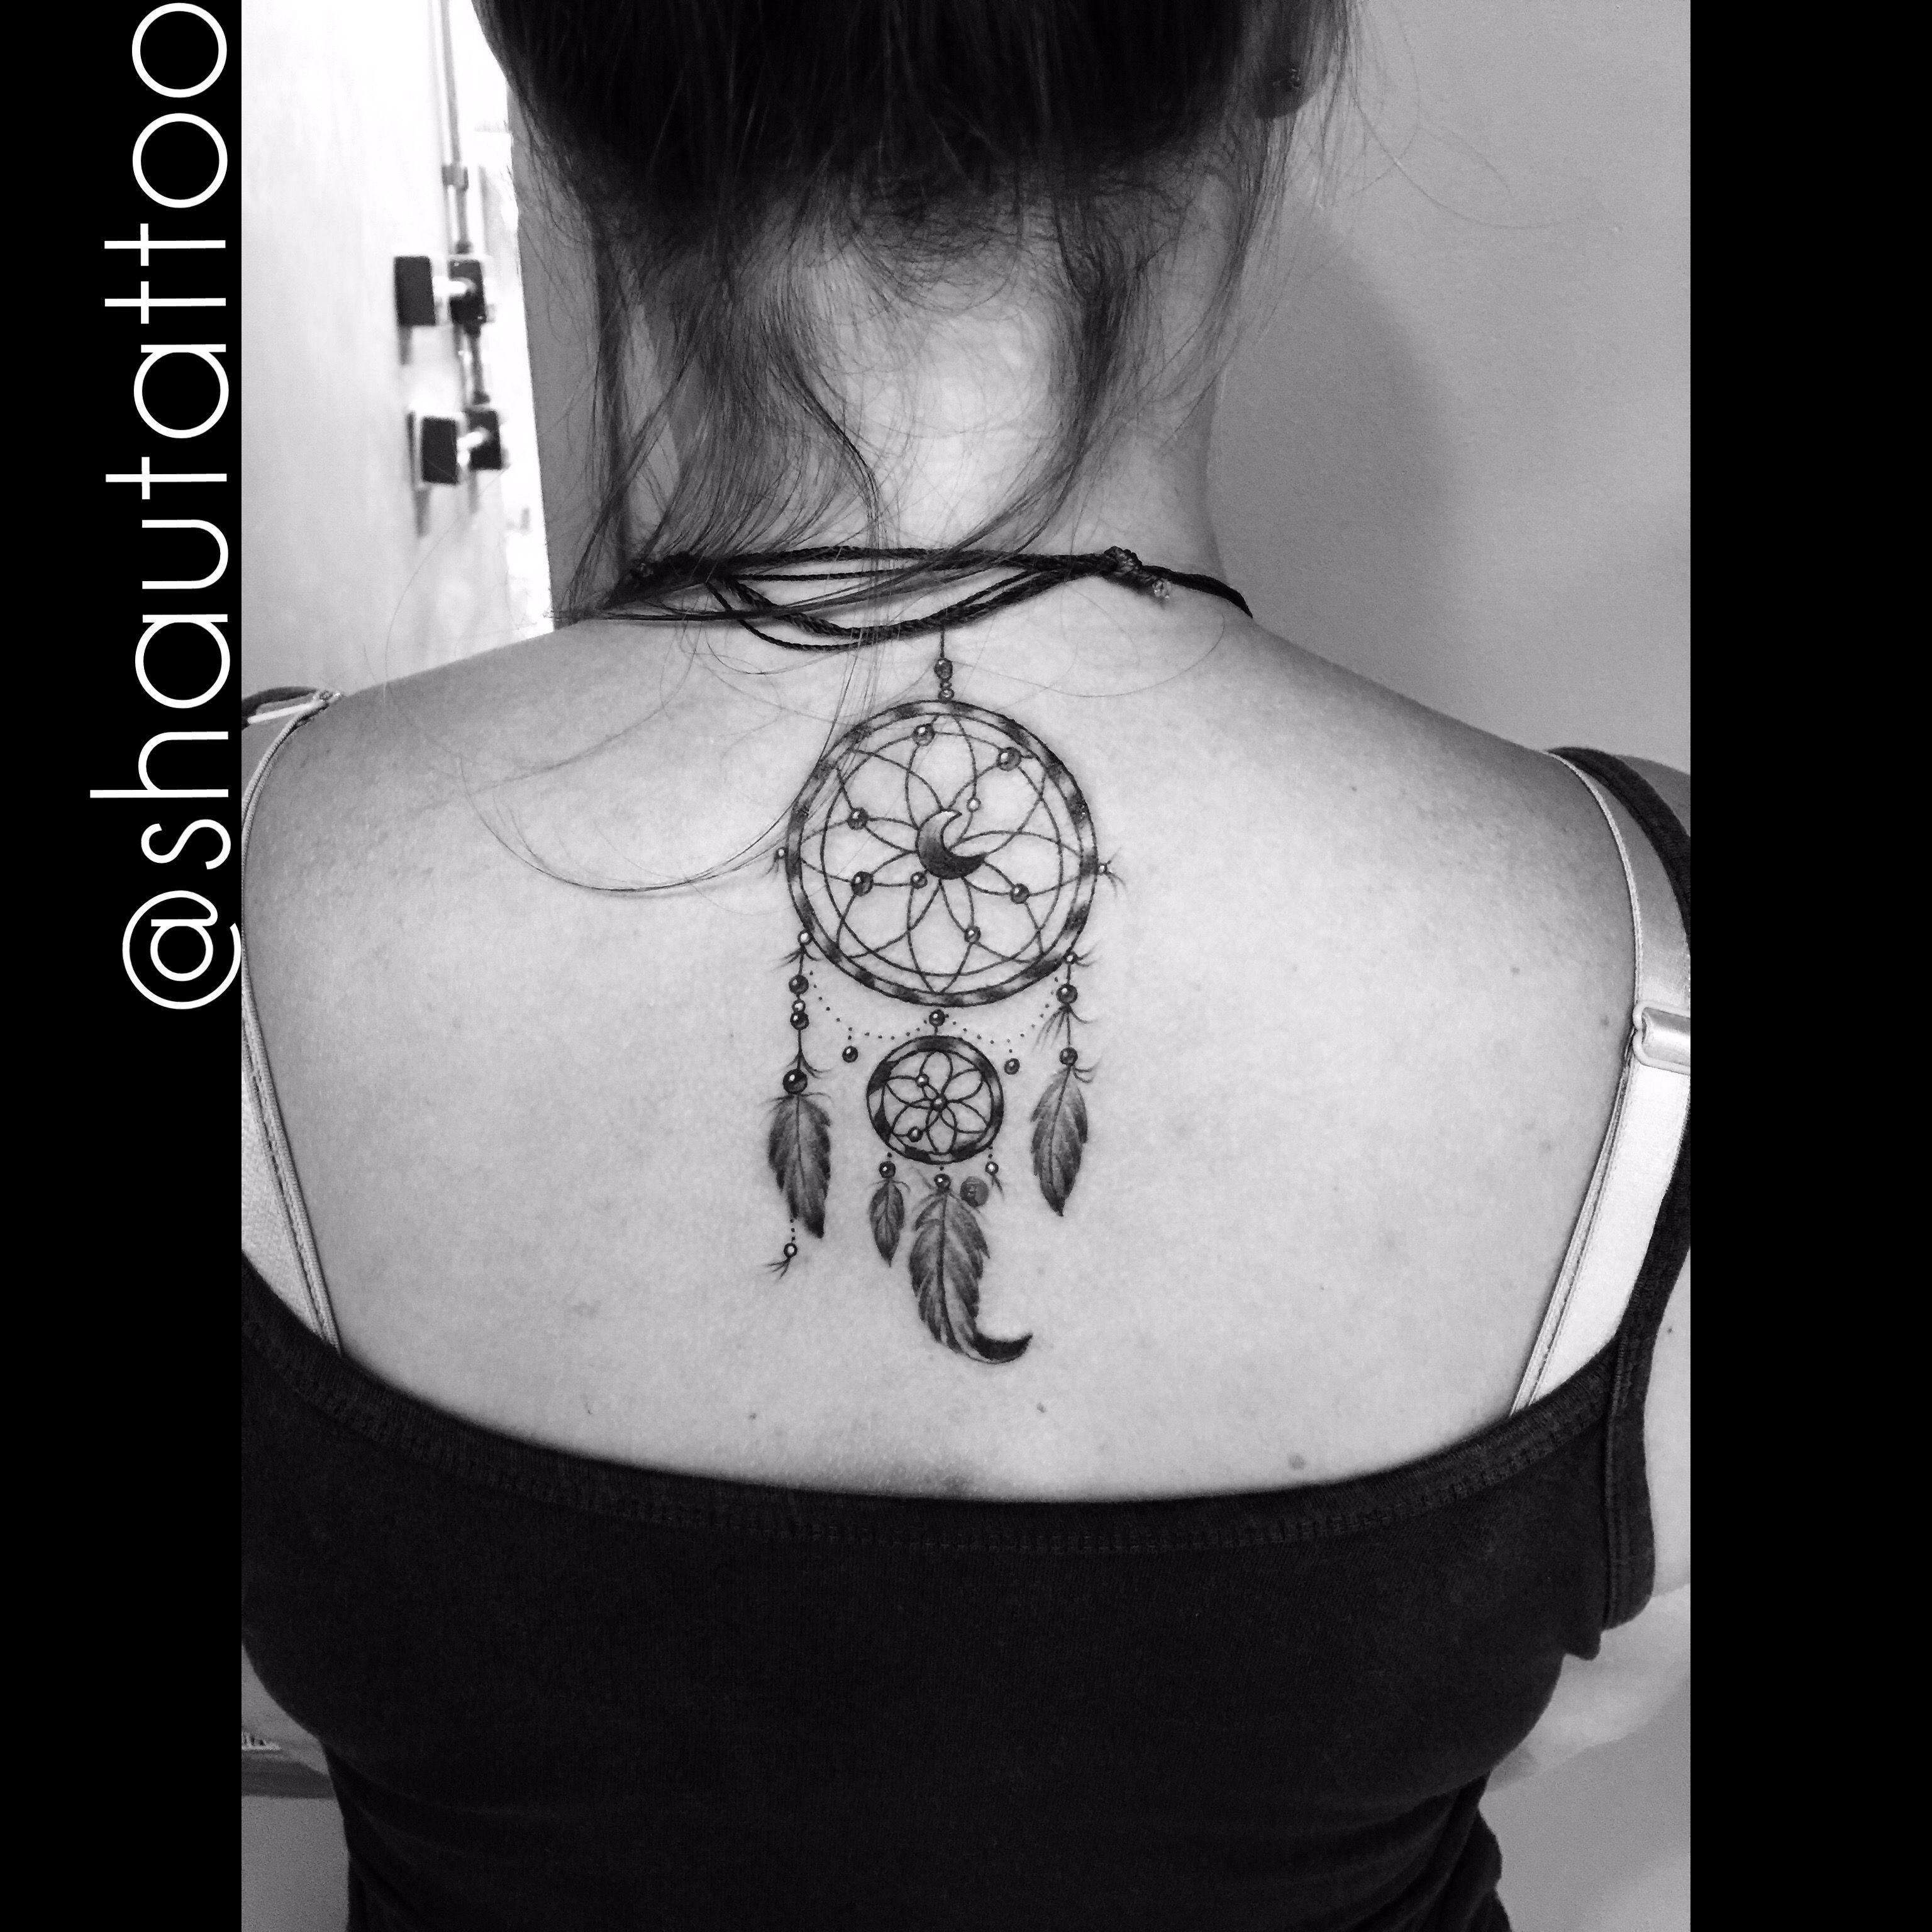 Trabalho feito hoje à tarde .  @shautattoo  @shautattoo  @shautattoo  #filtrodossonhos #filtrodossonhostattoo #tatuagemfeminina #tatuagemnascostas #tatuagemdelicada #dreamcatchertattoo #dreamcatcher #arte #art #tatuagemsalvador #inspiredtattoo #inspirationtatto #inspiracao #inspiration #inspired #tattoo2me